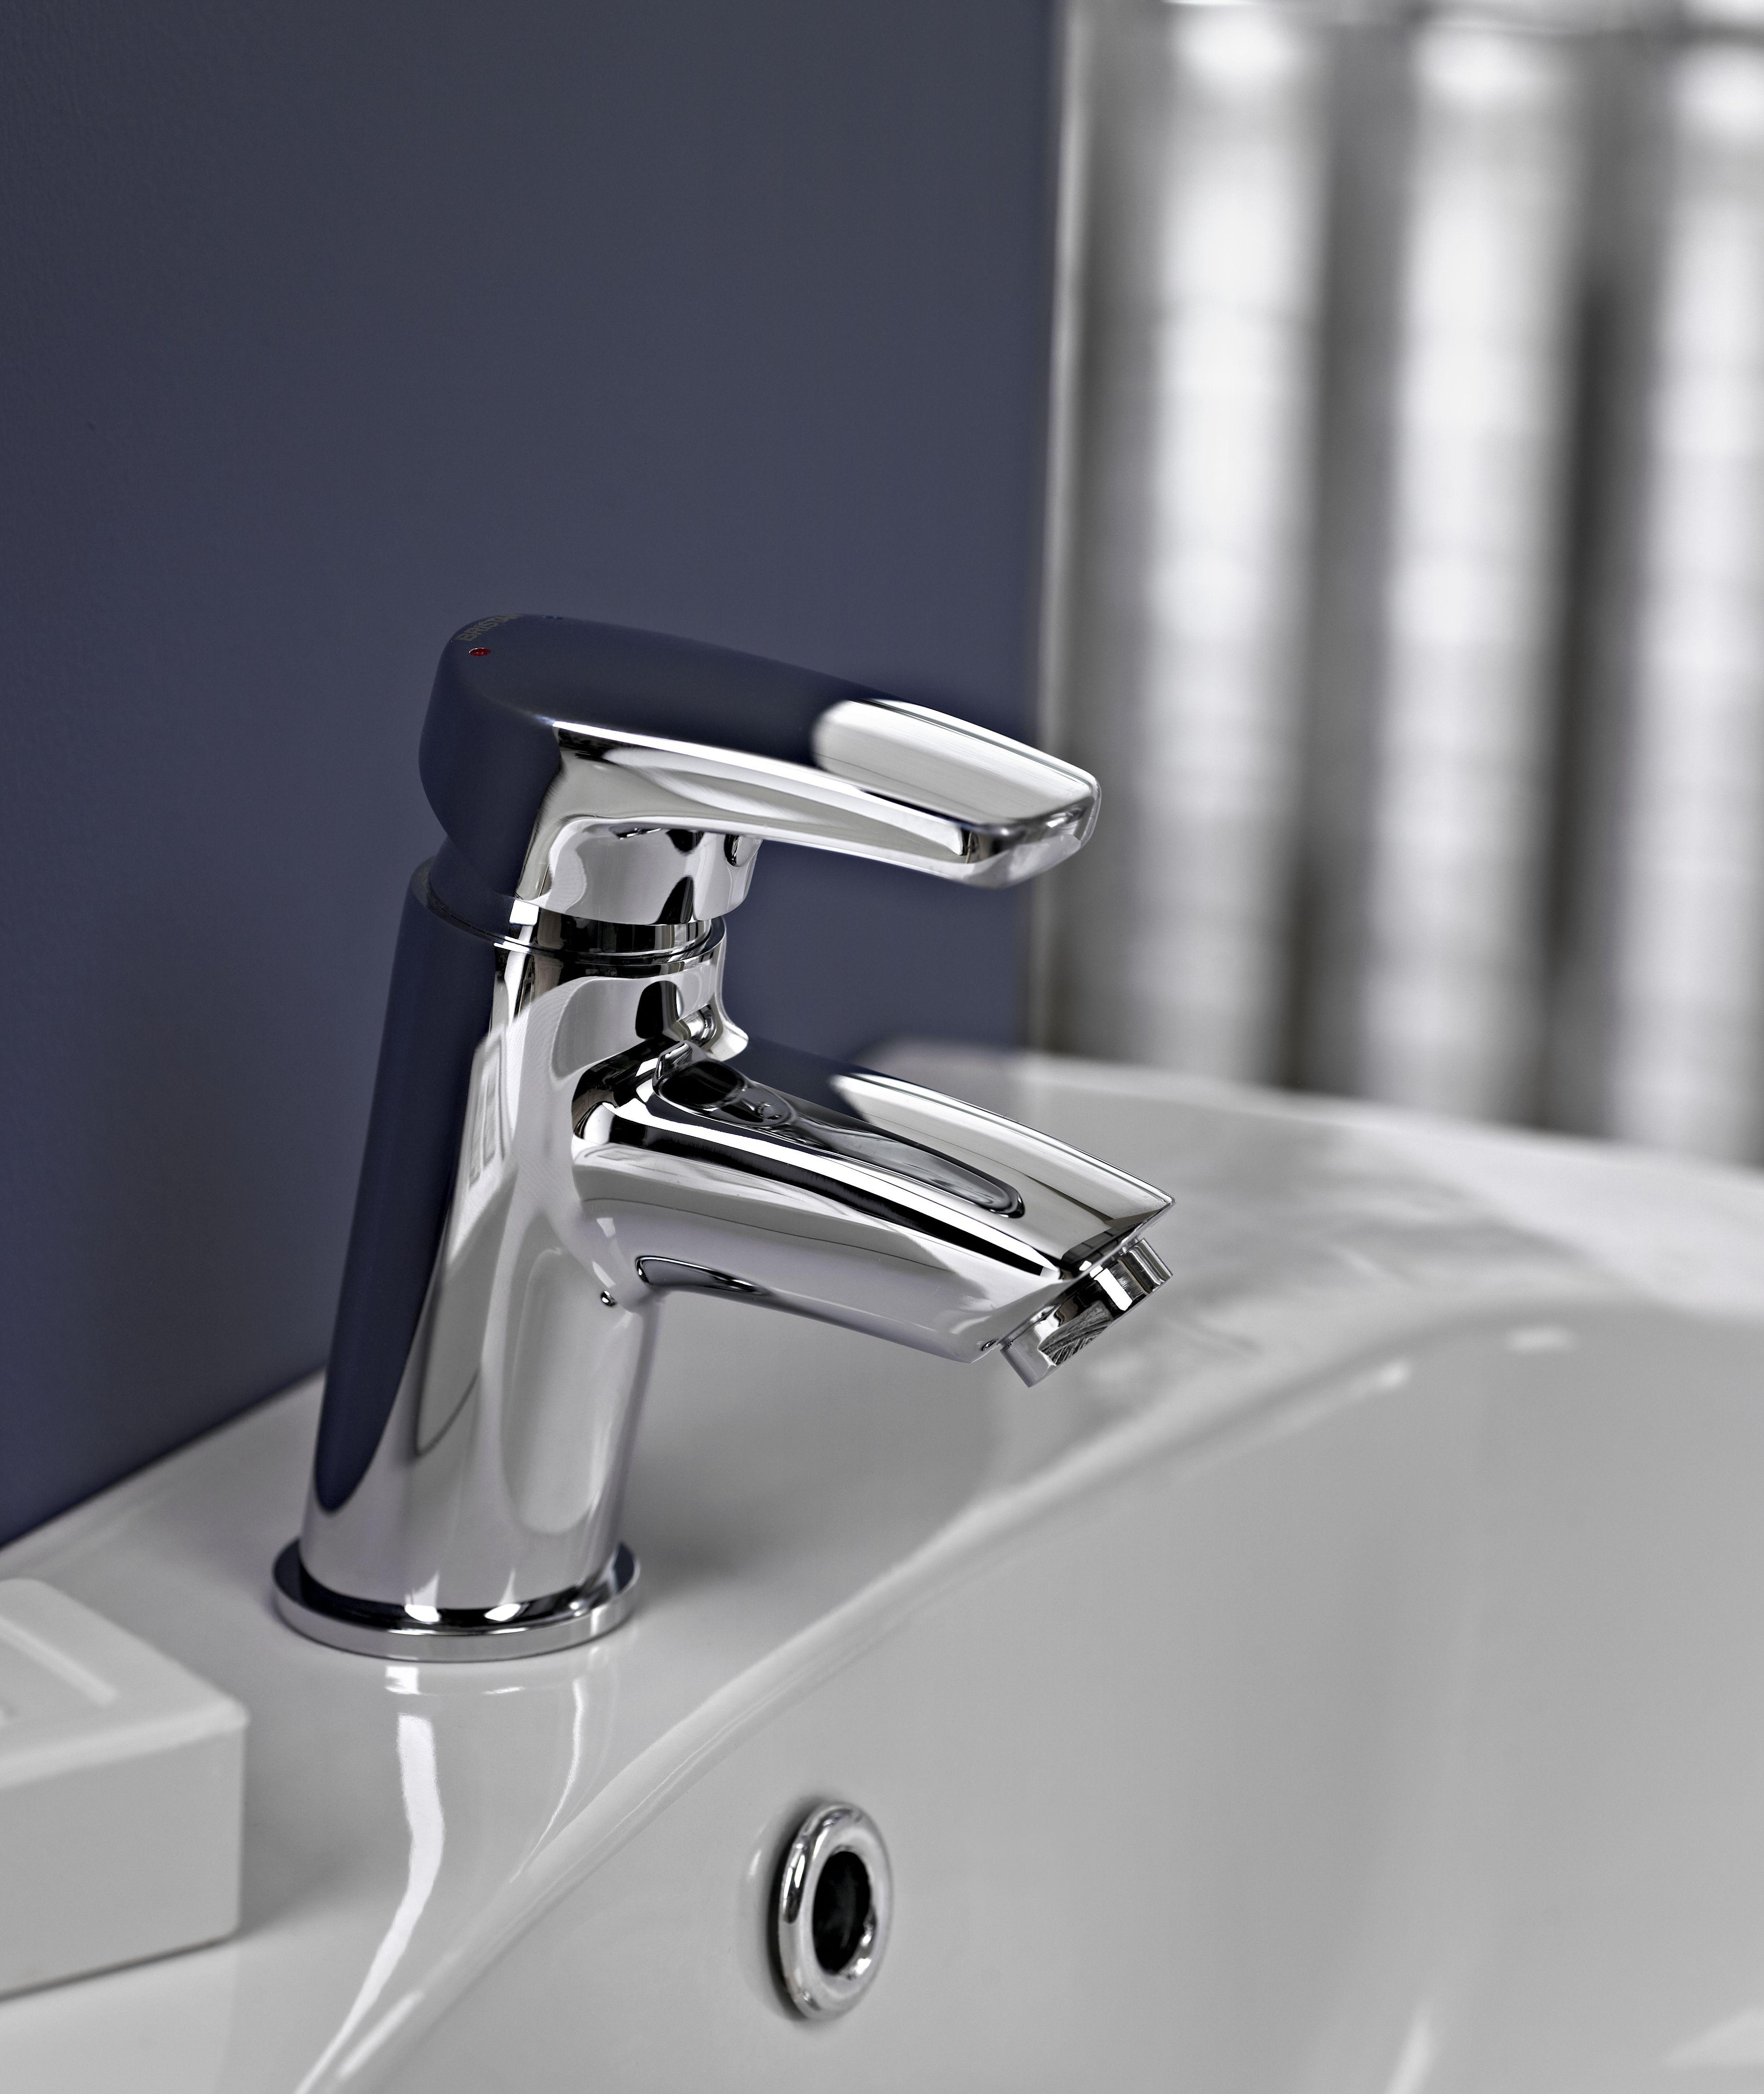 Replacing Taps In Bathroom 28 Images Replacing Taps In